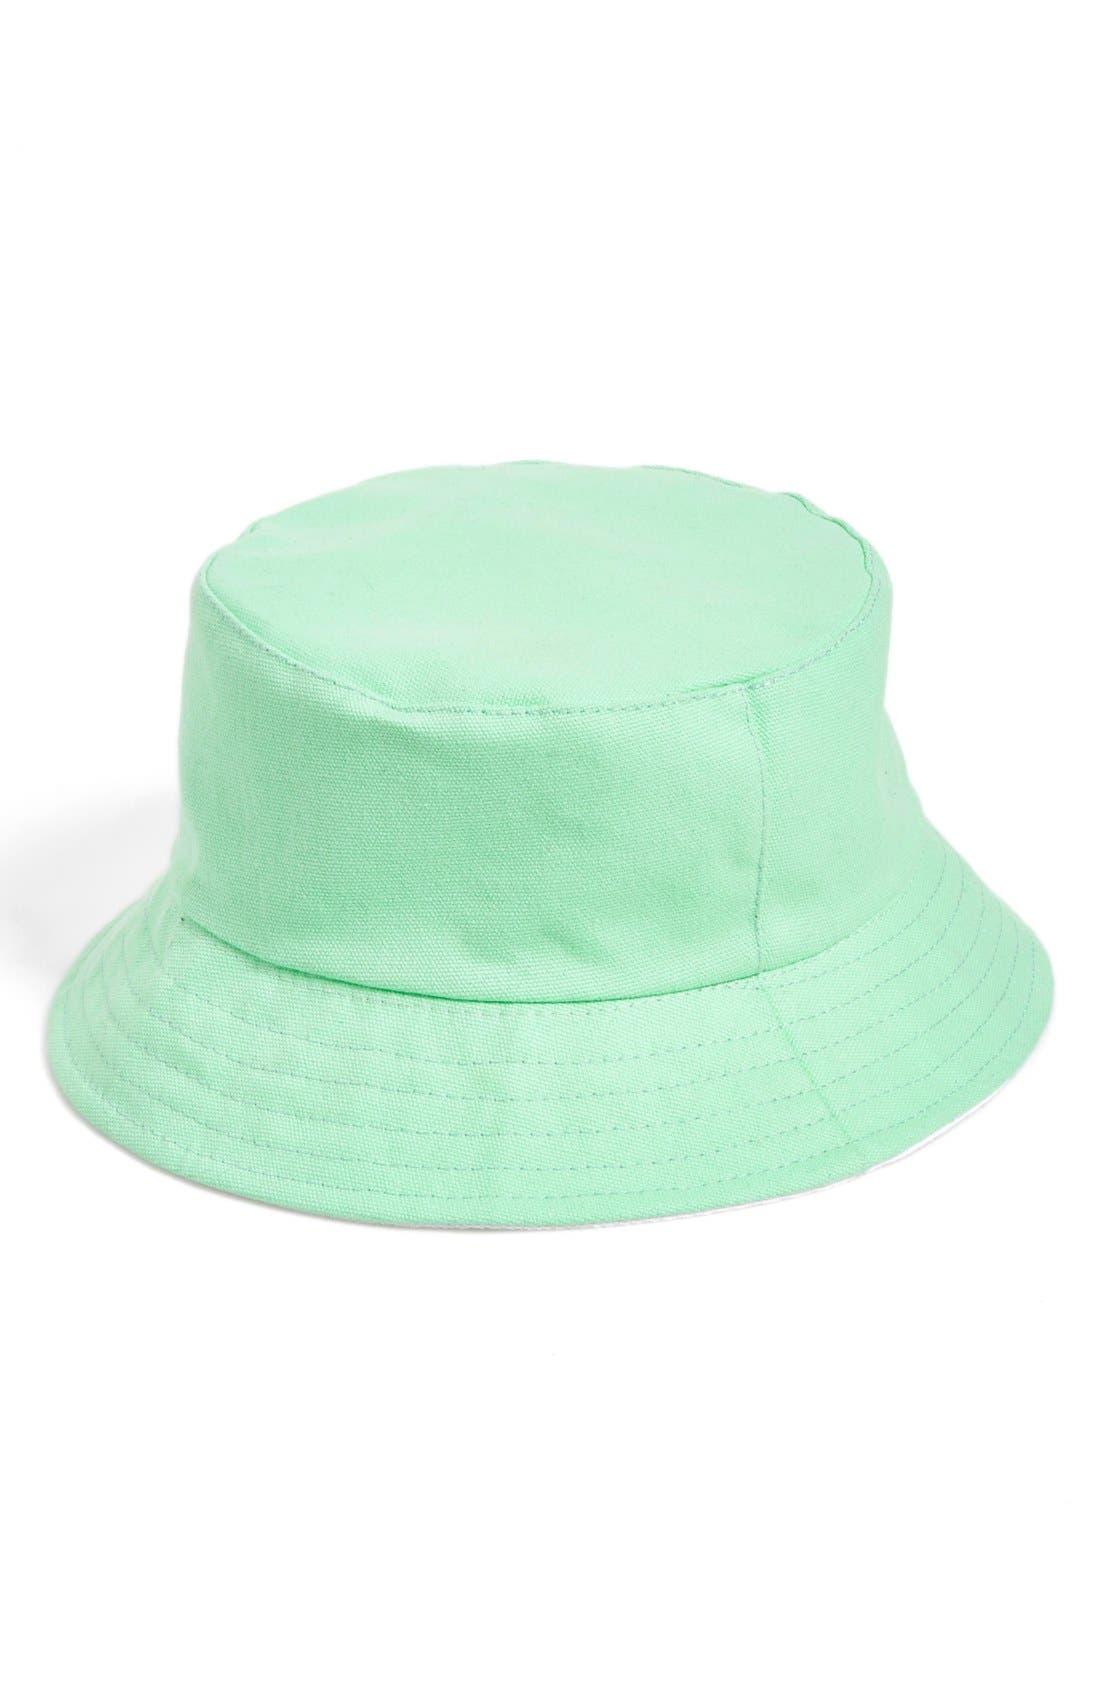 Alternate Image 1 Selected - Amici Accessories Reversible Bucket Hat (Juniors)